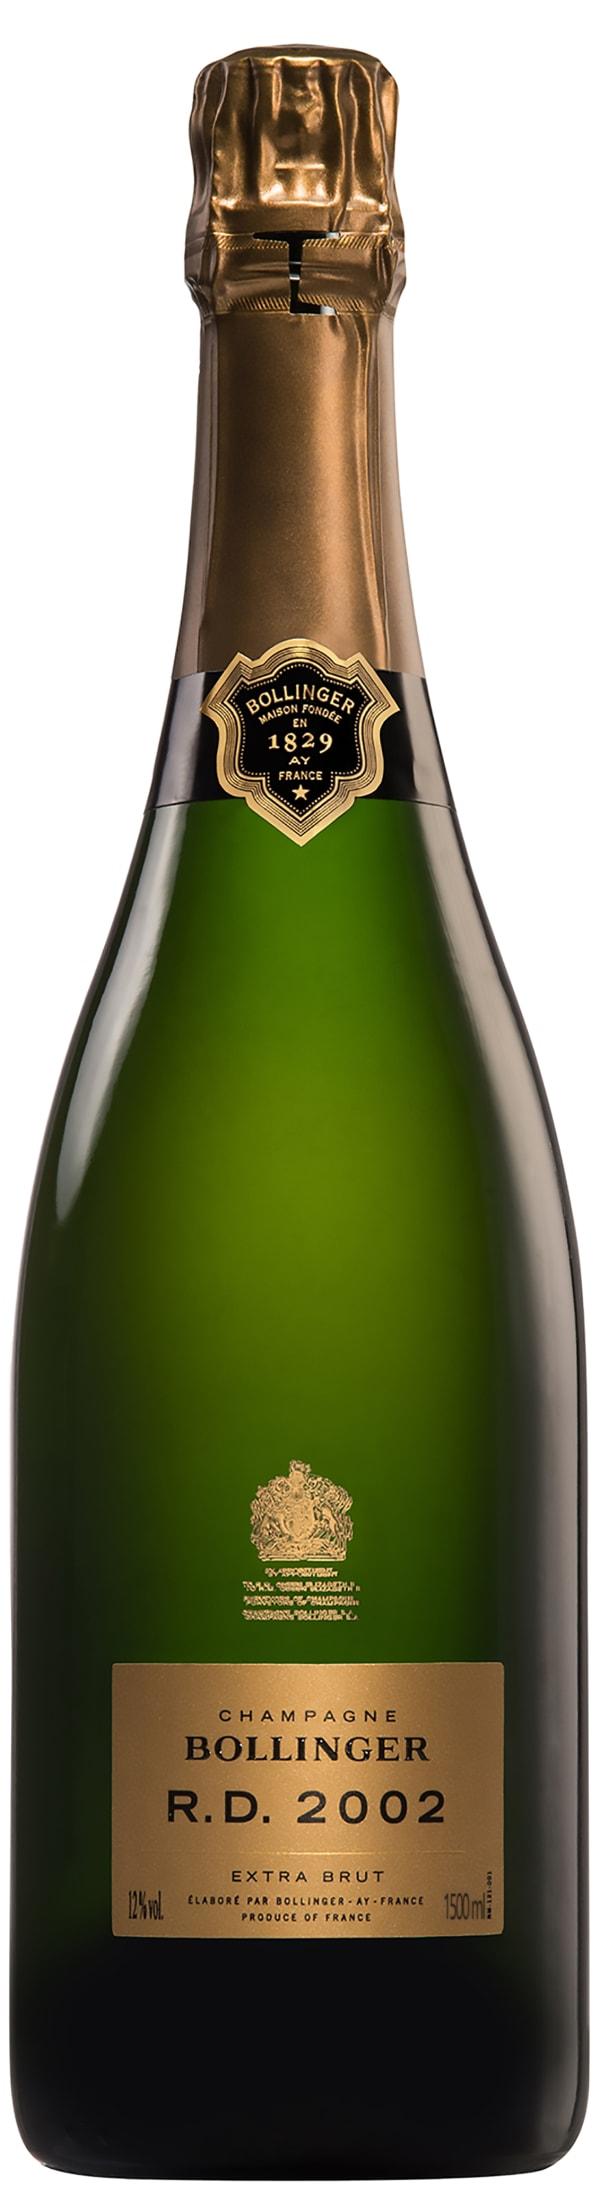 Bollinger R.D. Champagne 2002